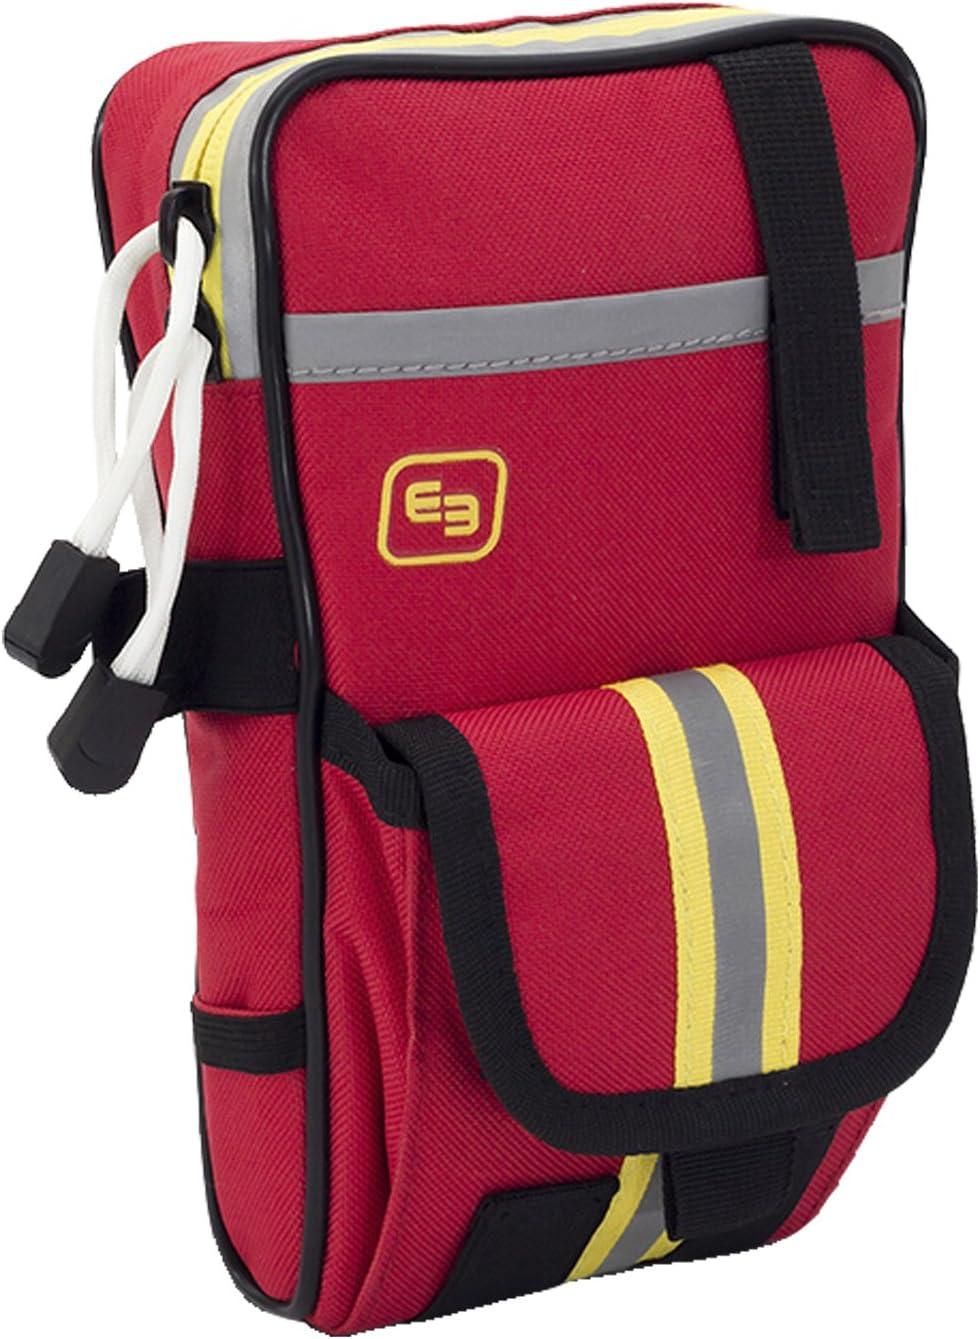 Elite Bags - Resq's Funda de rescate (rojo)